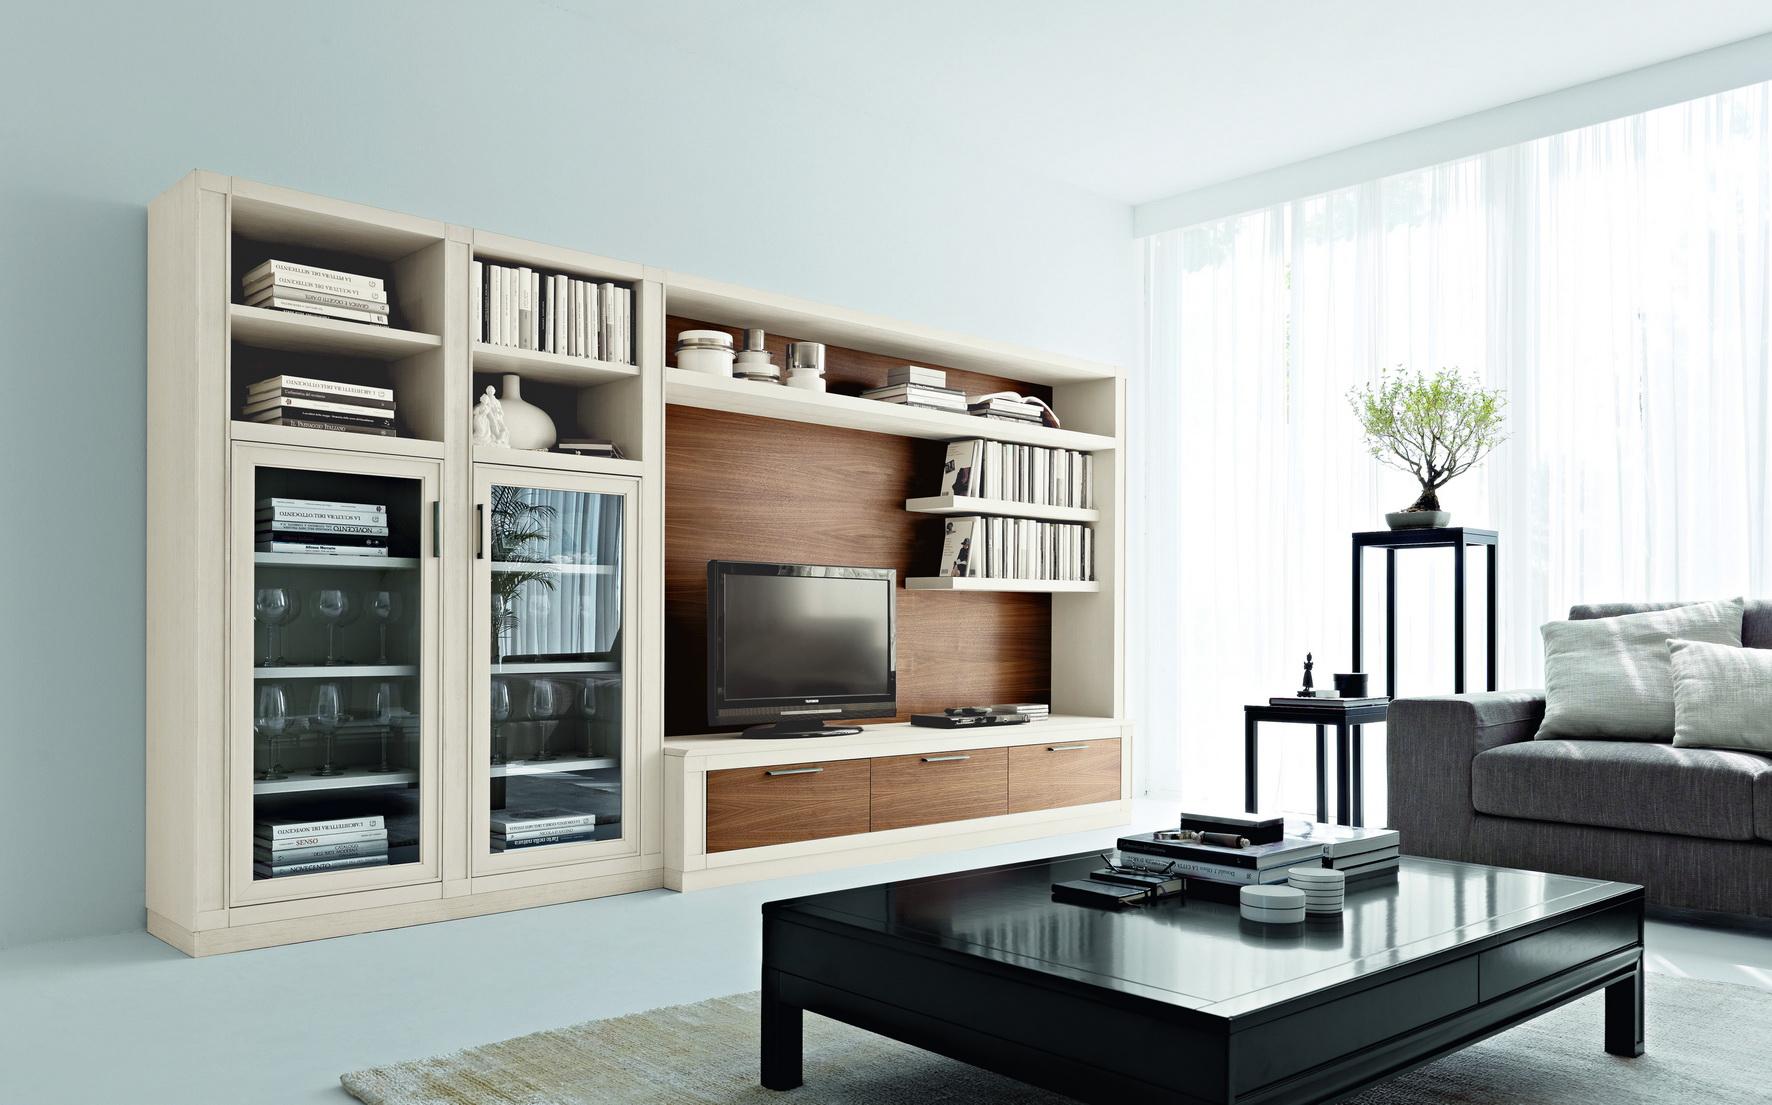 Parete attrezzata moderna lf10059 c4 home arredamenti for Parete decorata moderna